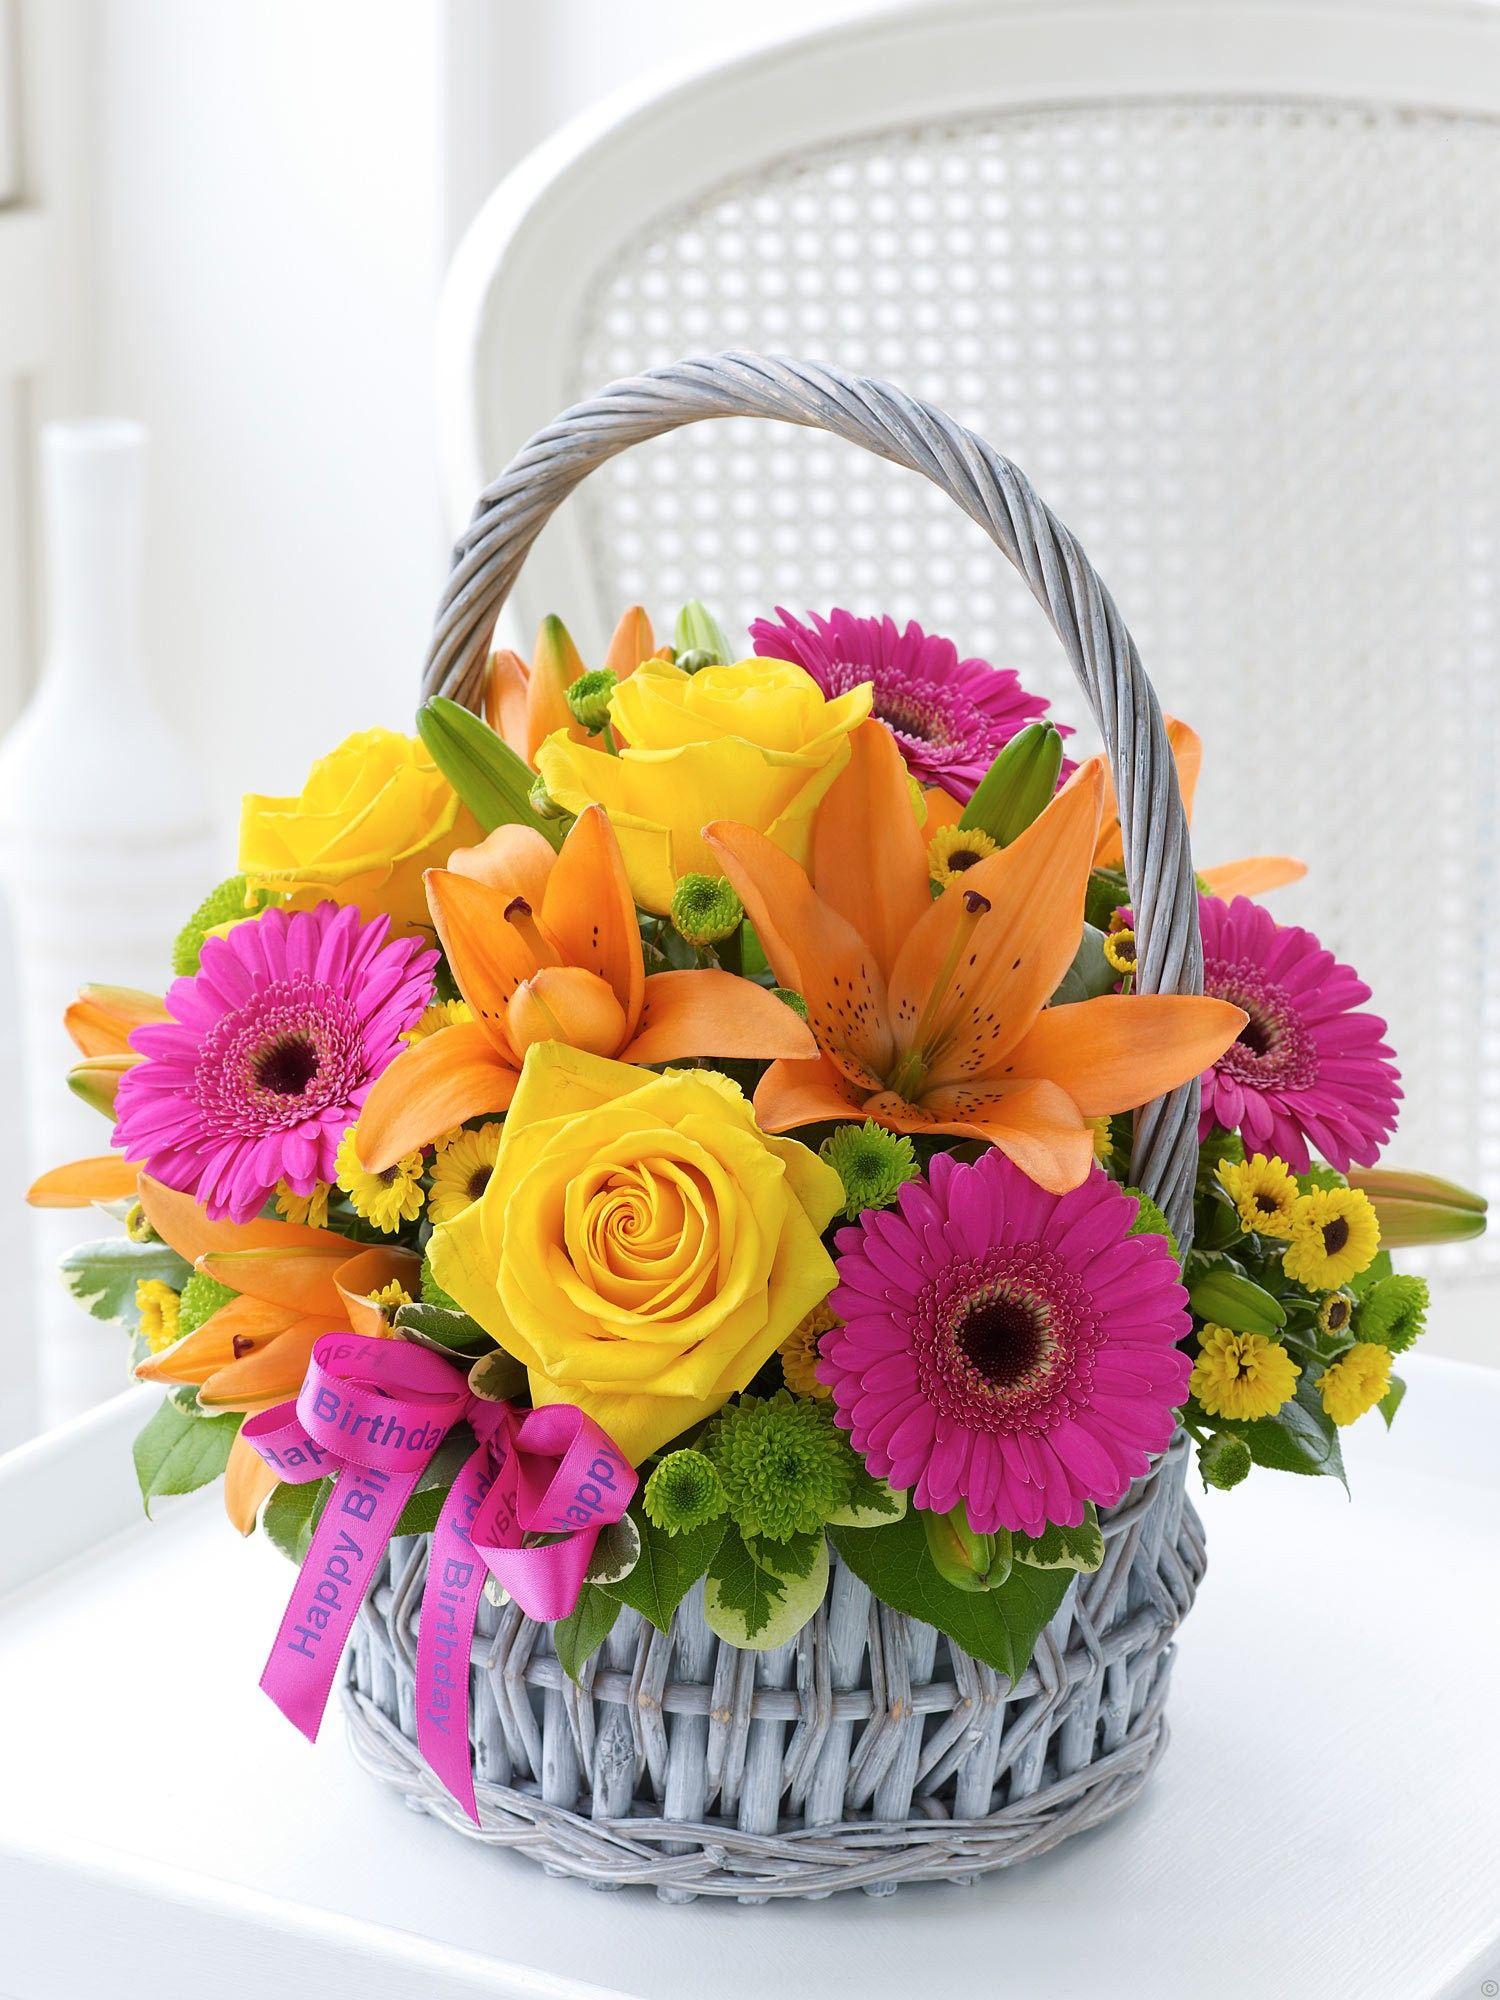 Birthday Flower Bouquets Happy birthday flower, Birthday